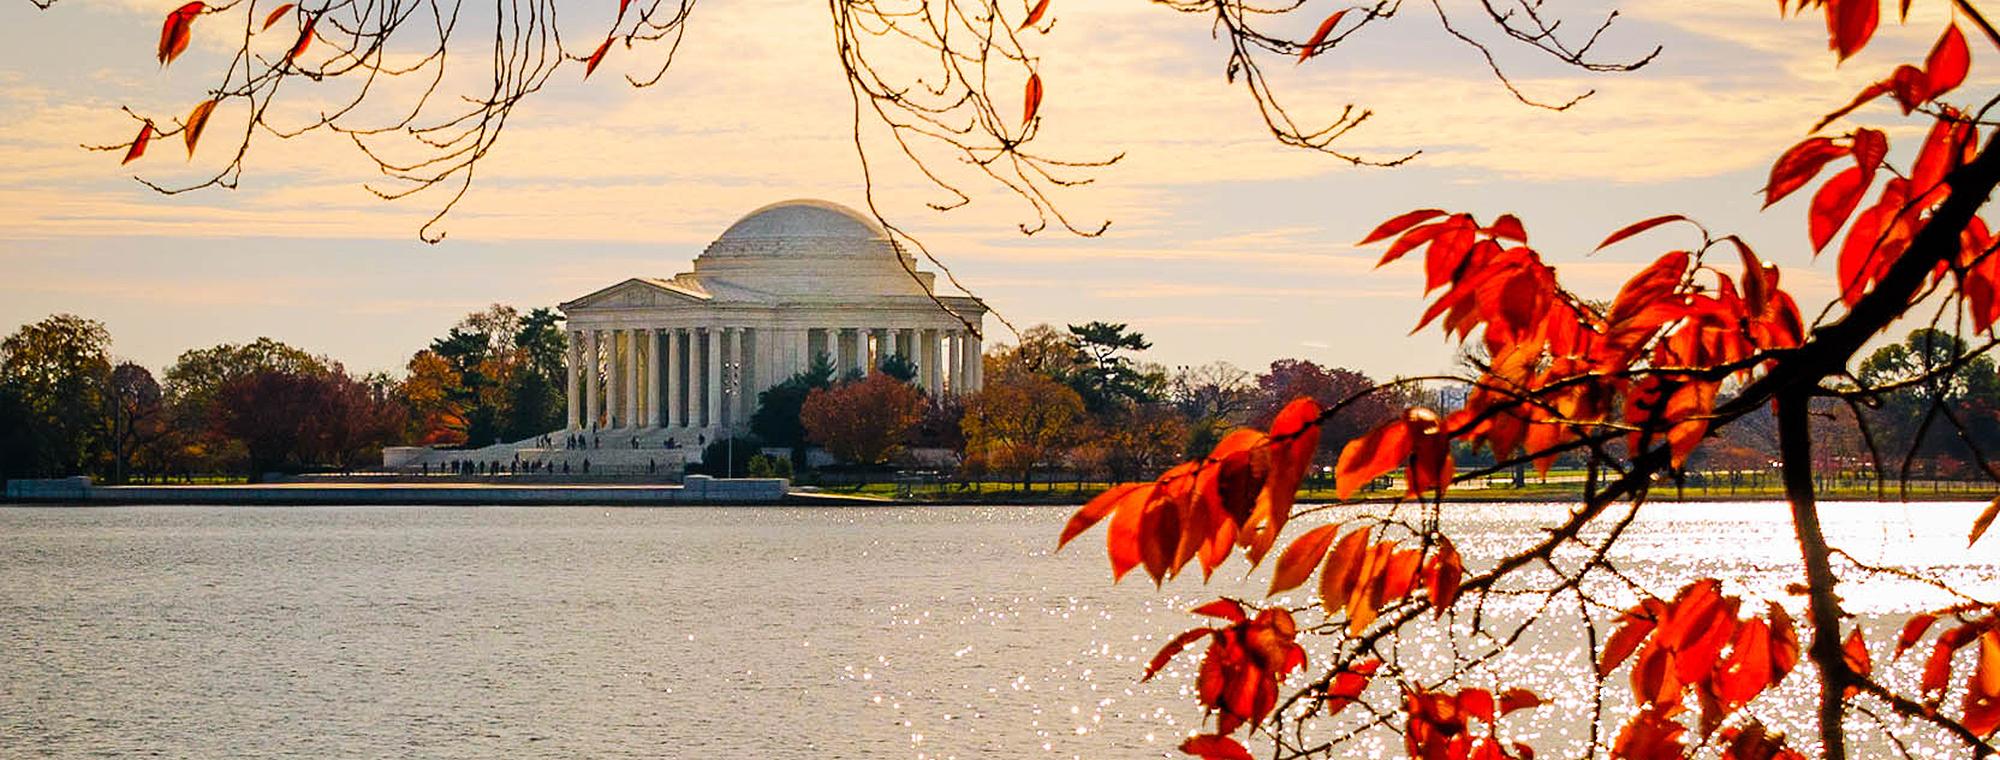 Jefferson Memorial in the fall